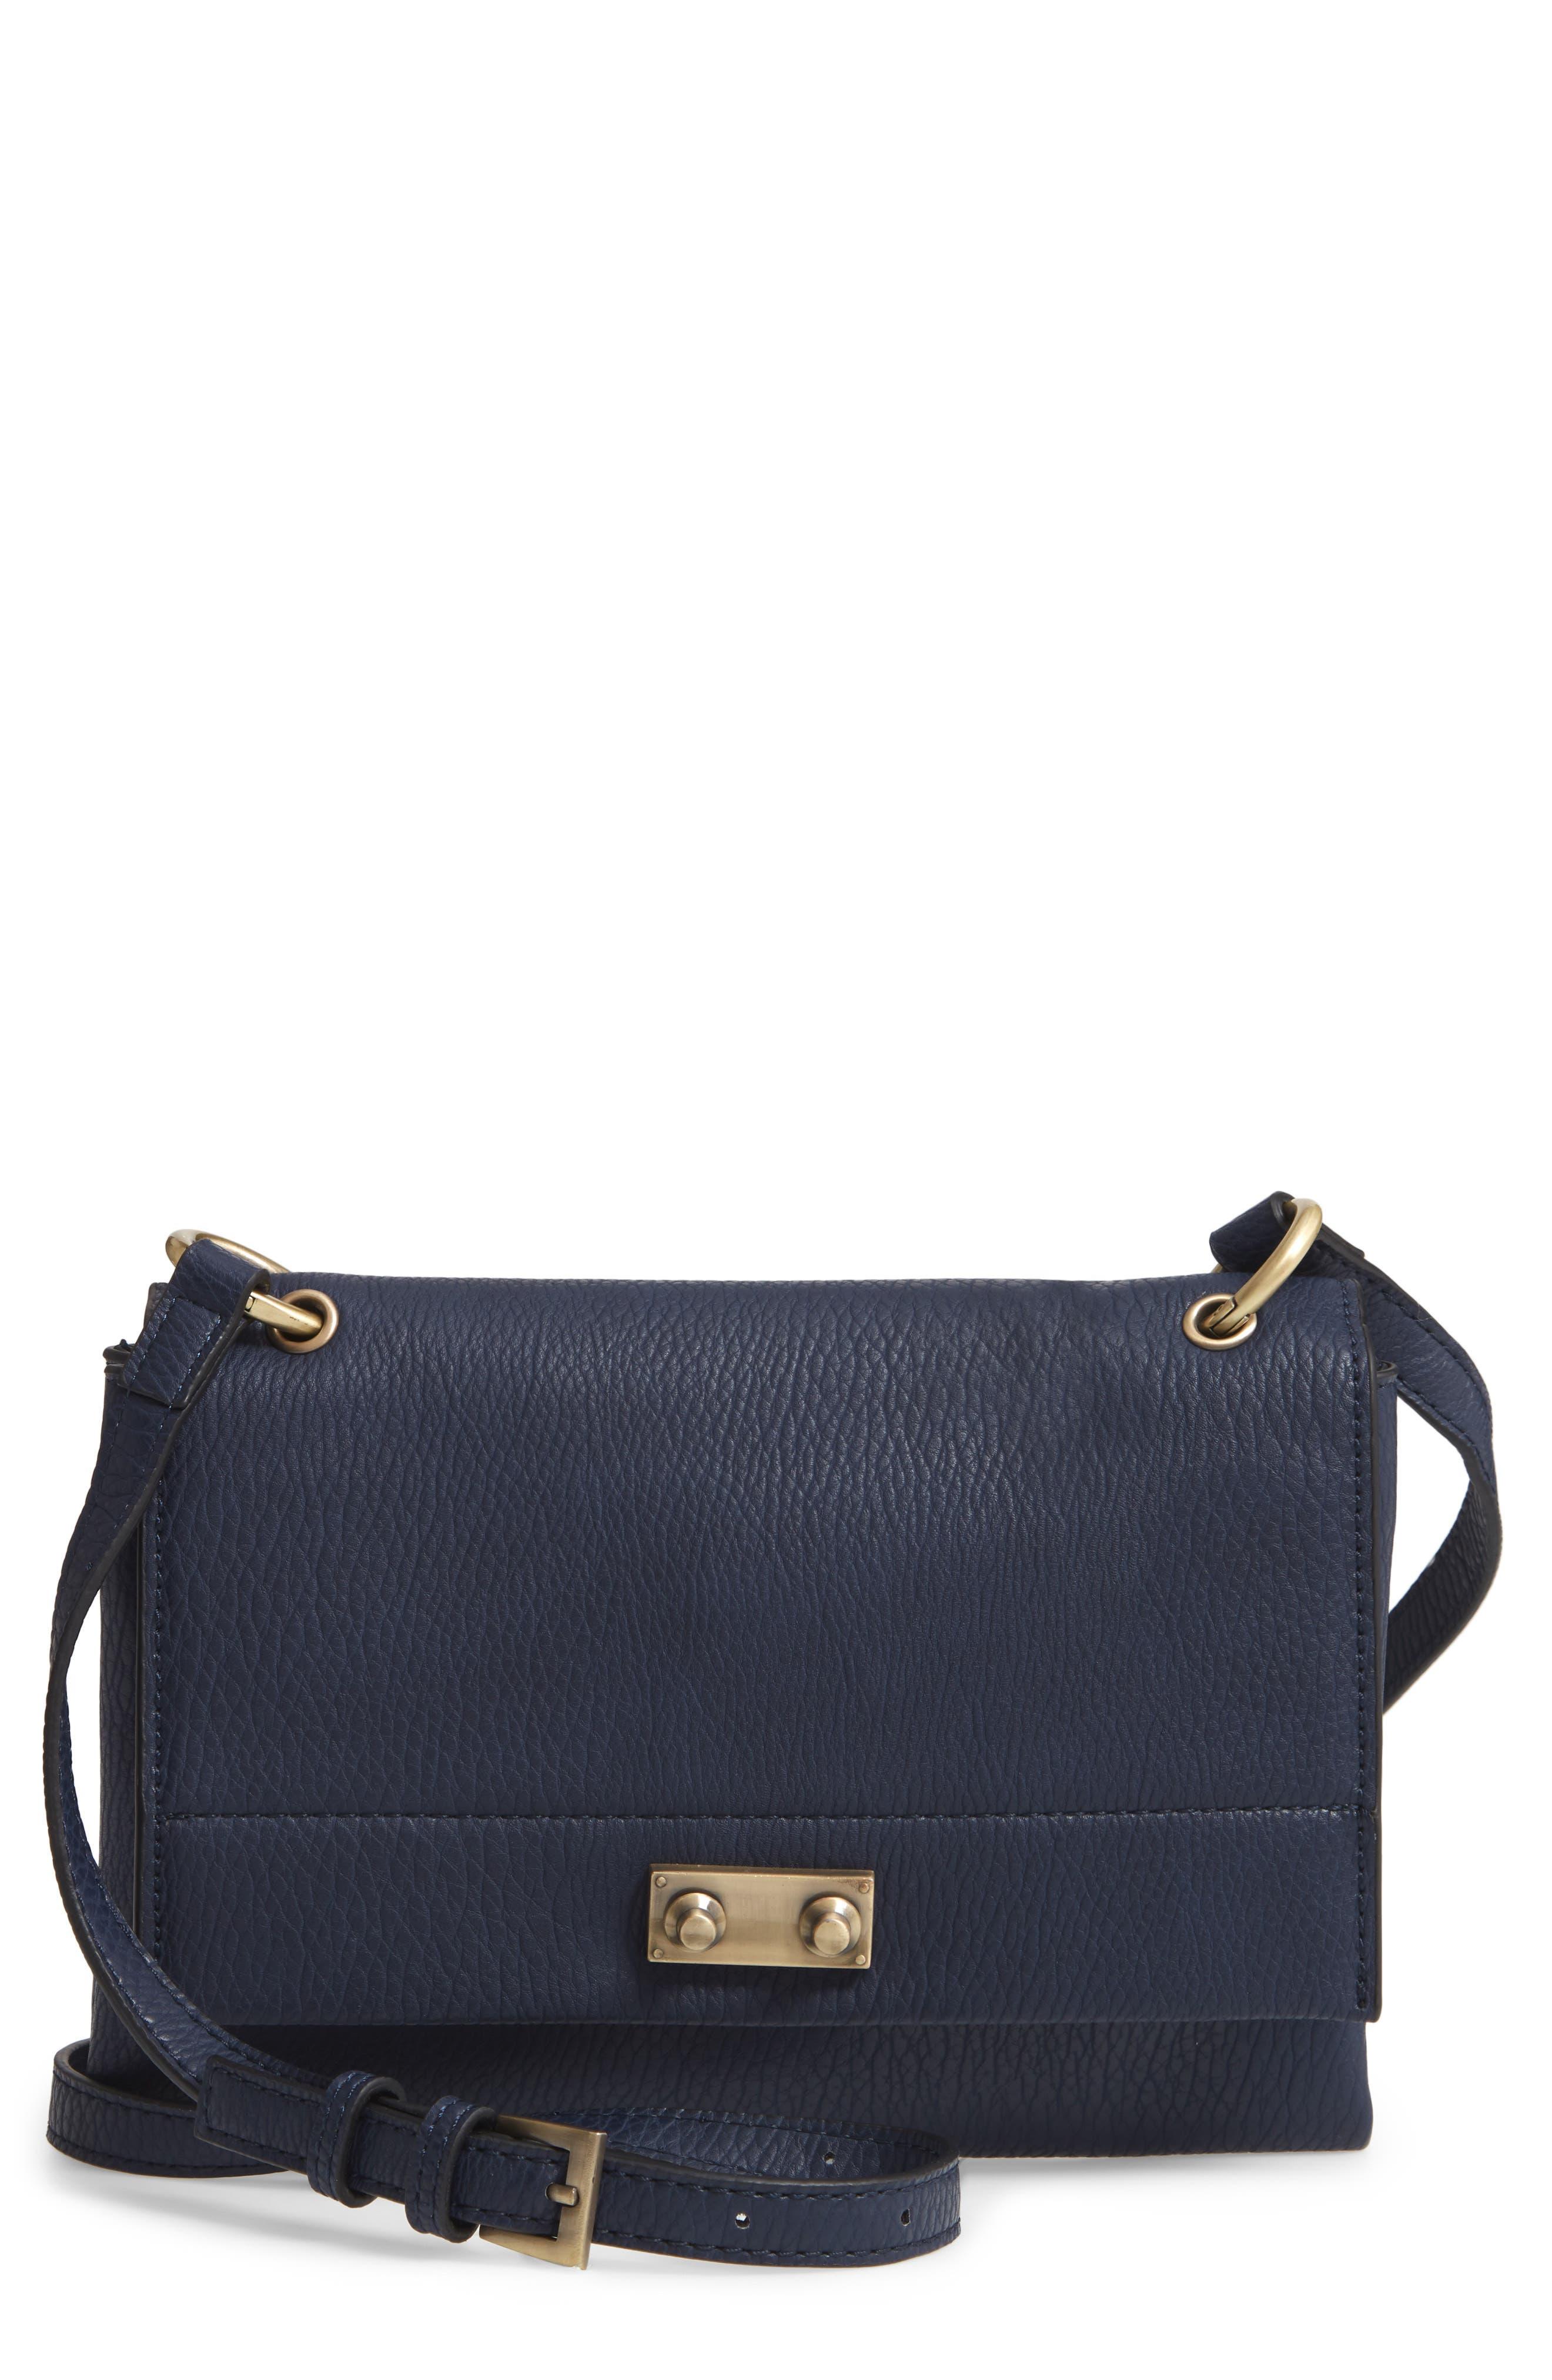 SONDRA ROBERTS Faux Leather Crossbody Bag - Blue in Navy